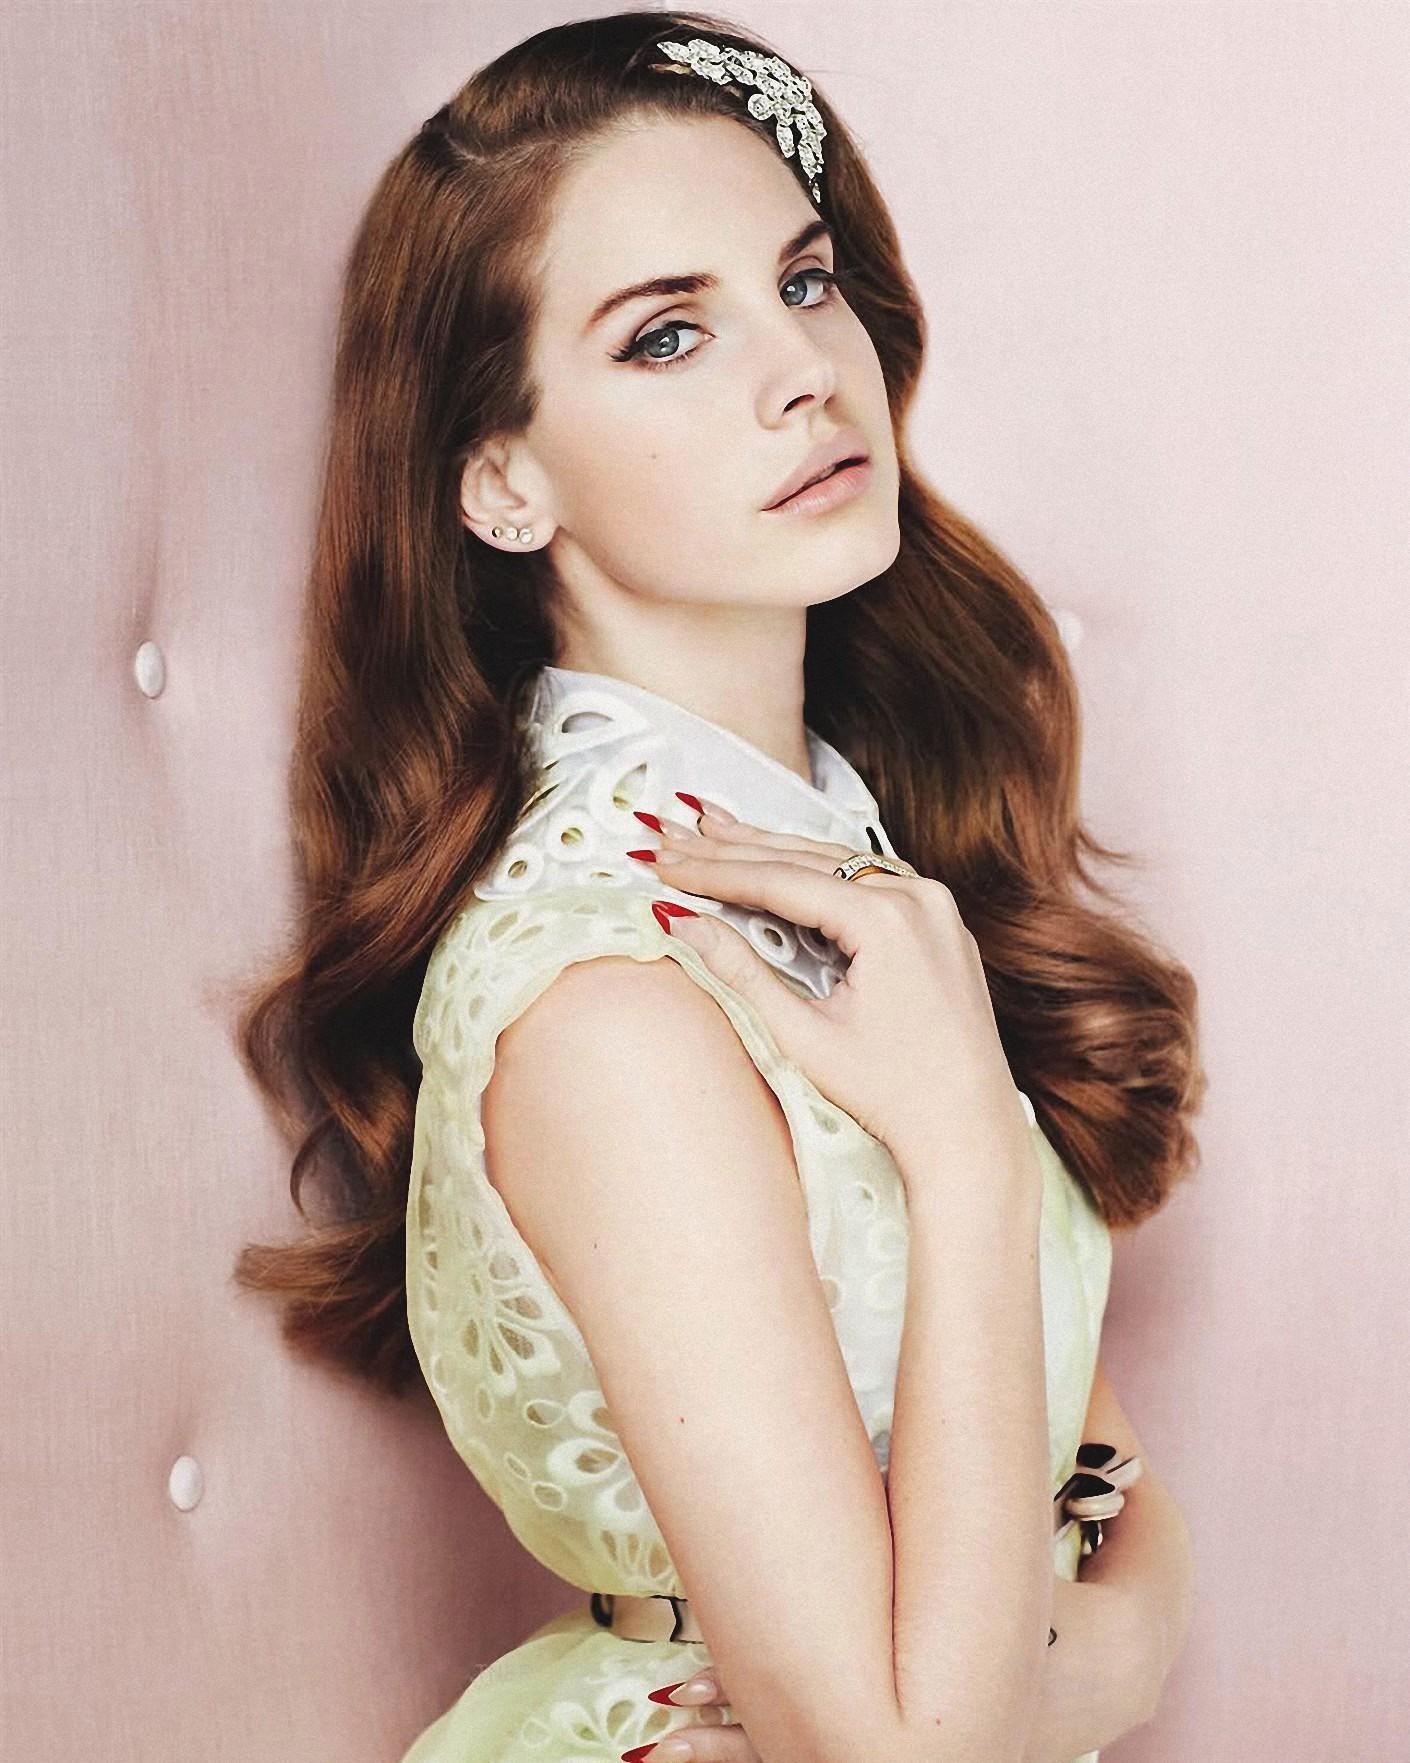 Lana Del Rey Iphone Wallpaper Posted By Samantha Mercado